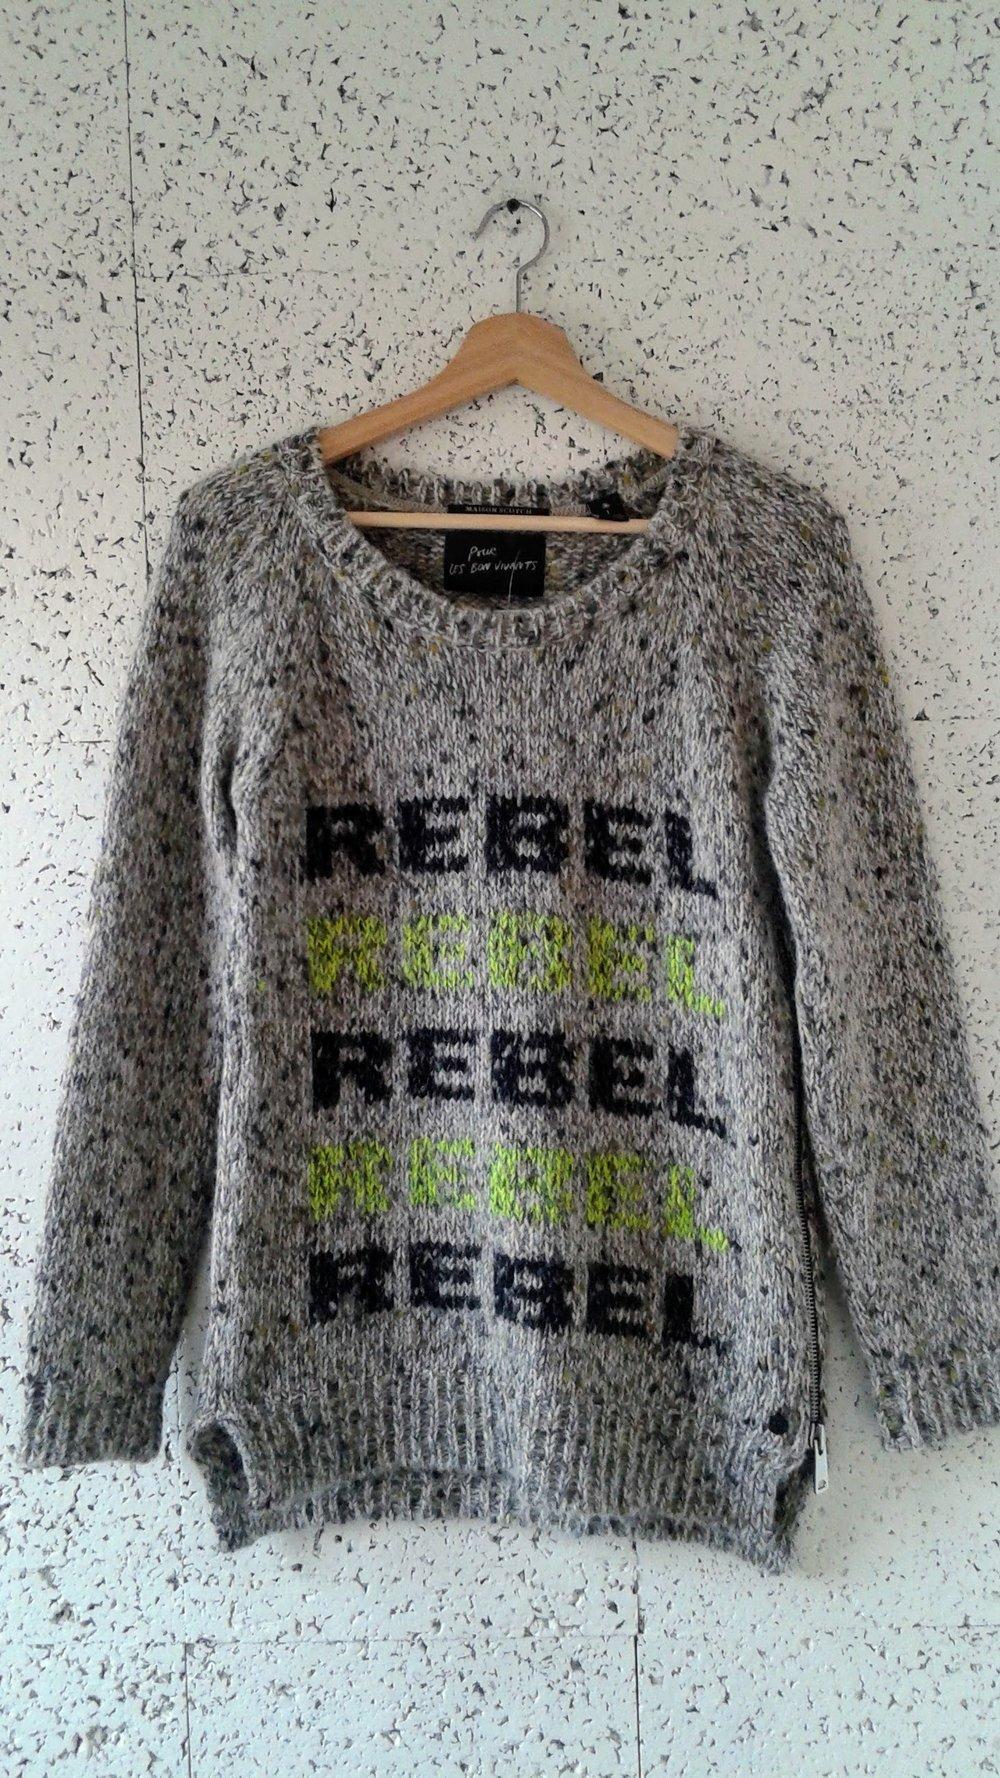 Maison Scotch  sweater; Size S, $34